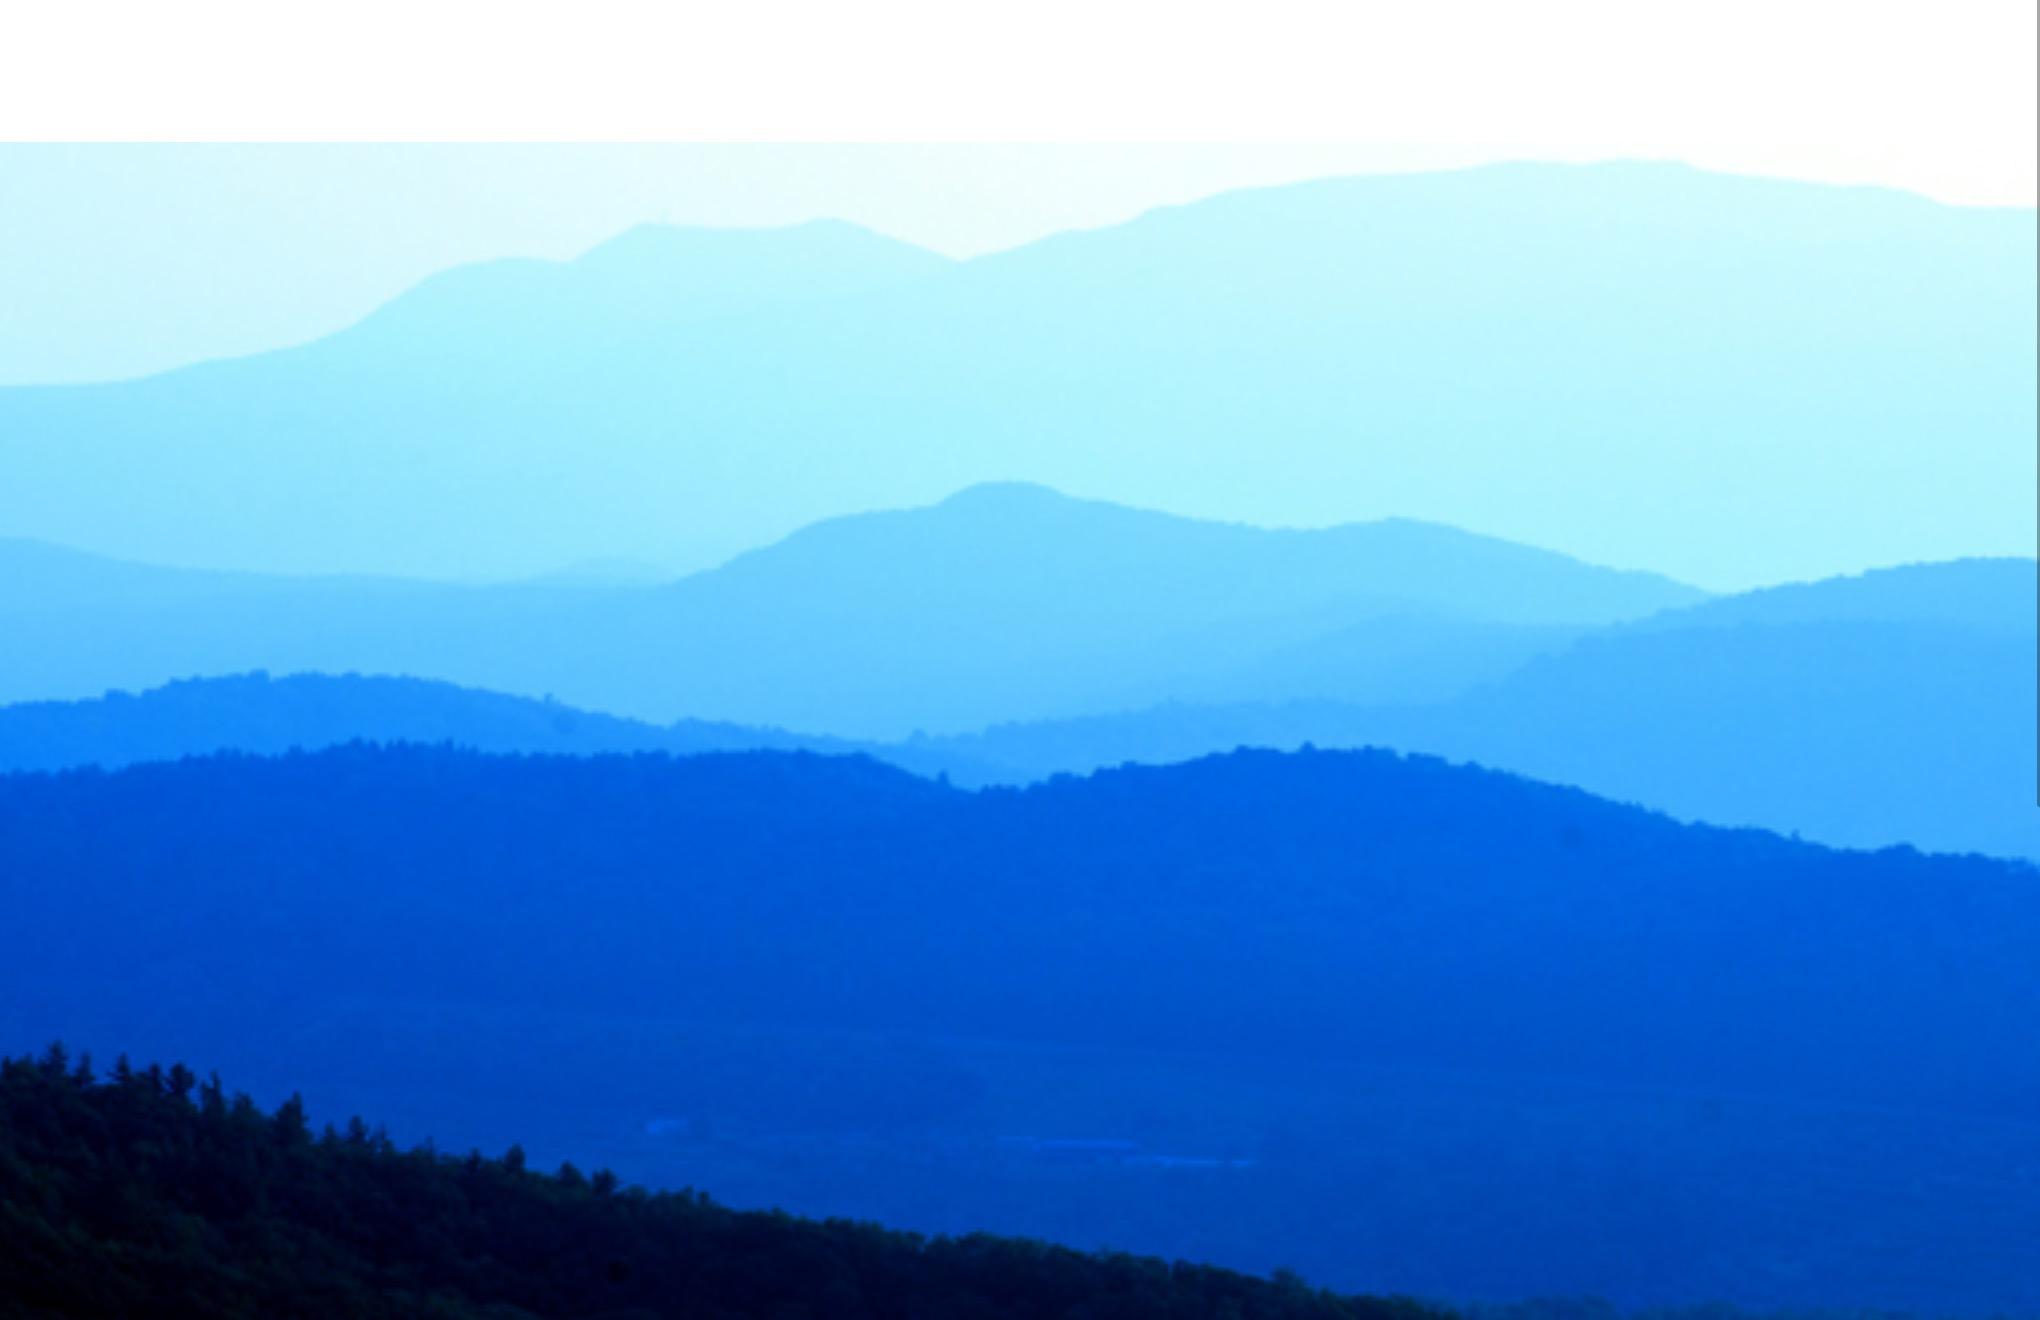 bluemountains.jpg